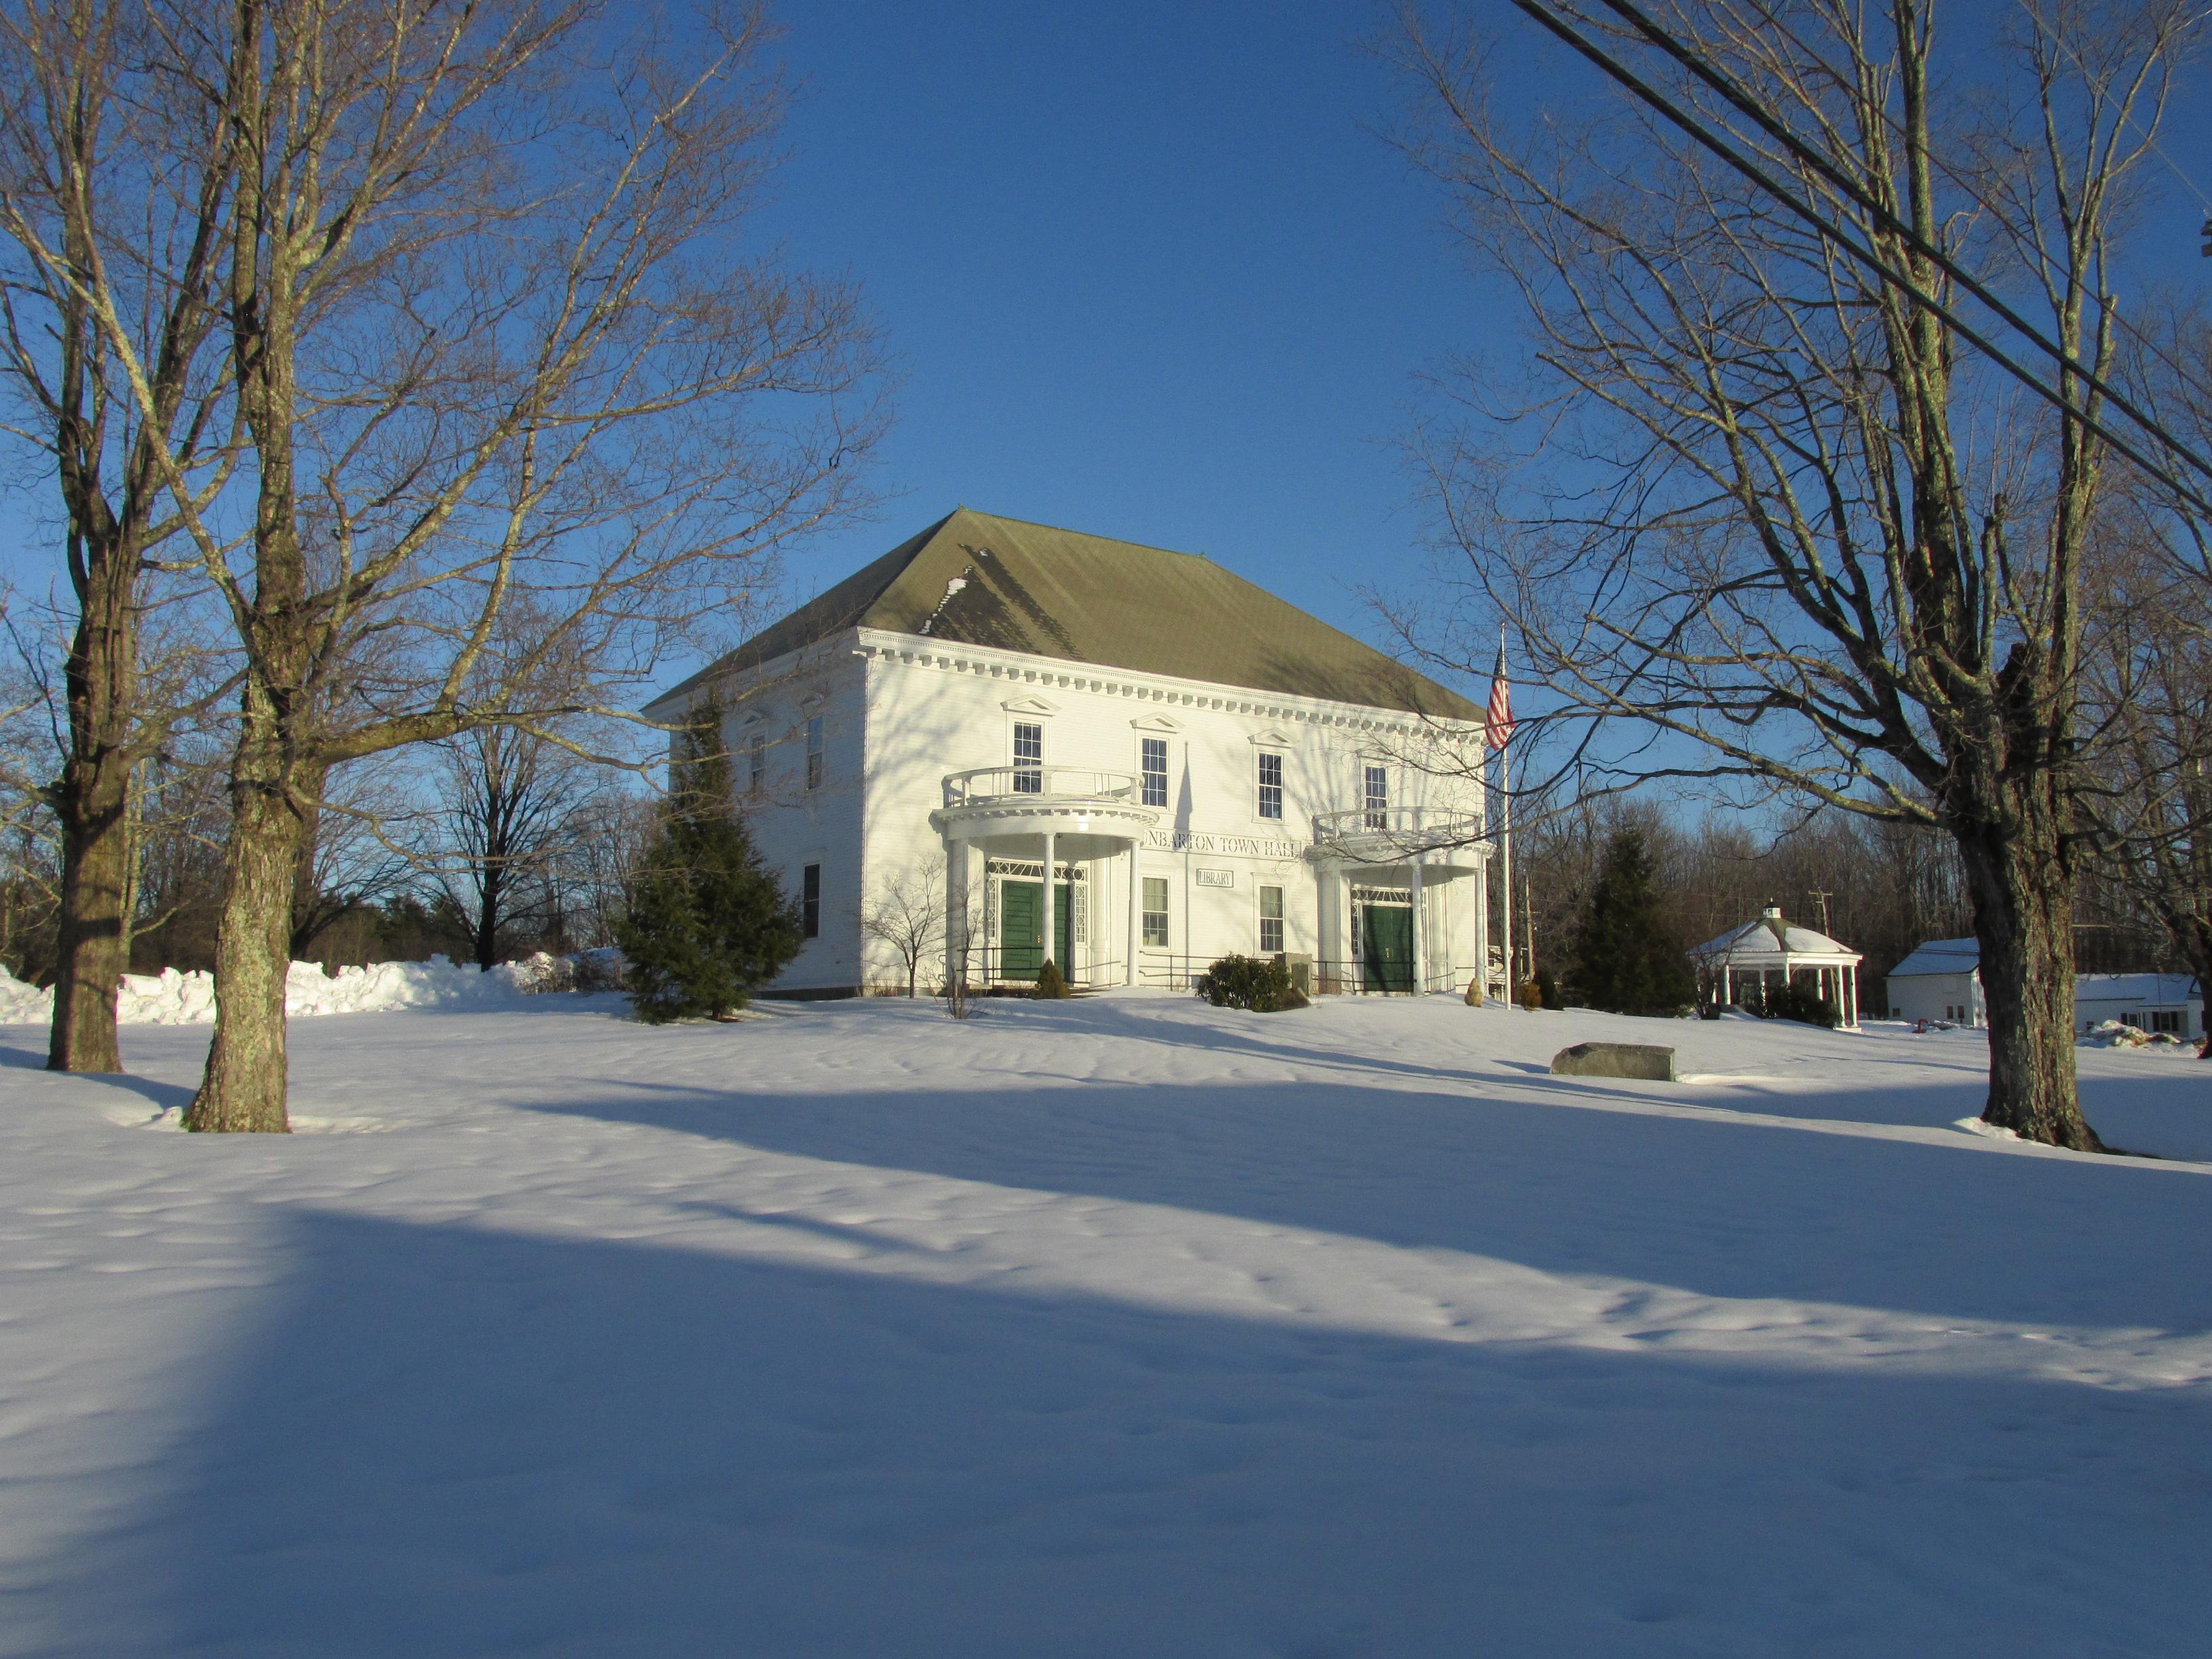 File:Dunbarton Library and Town Hall, Dunbarton NH.jpg - Wikimediadunbarton town